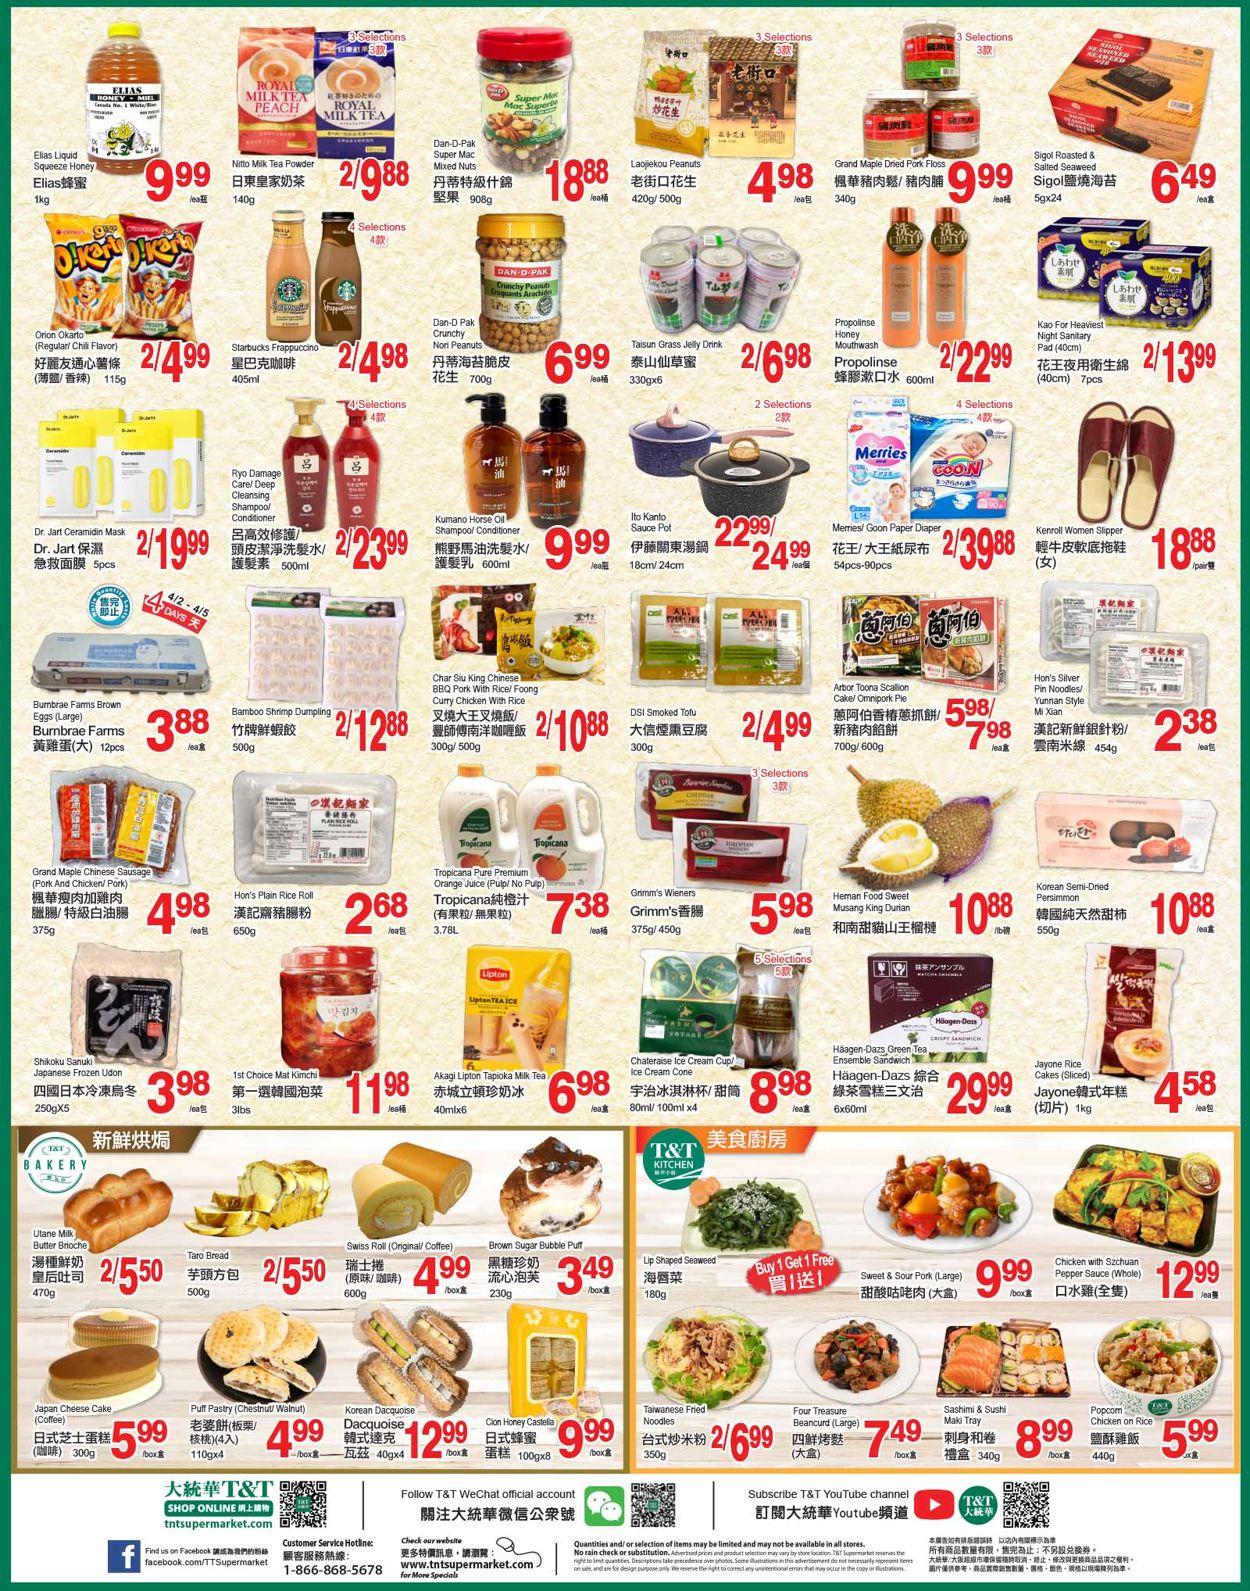 T&T Supermarket - Alberta Flyer - 04/02-04/08/2021 (Page 3)